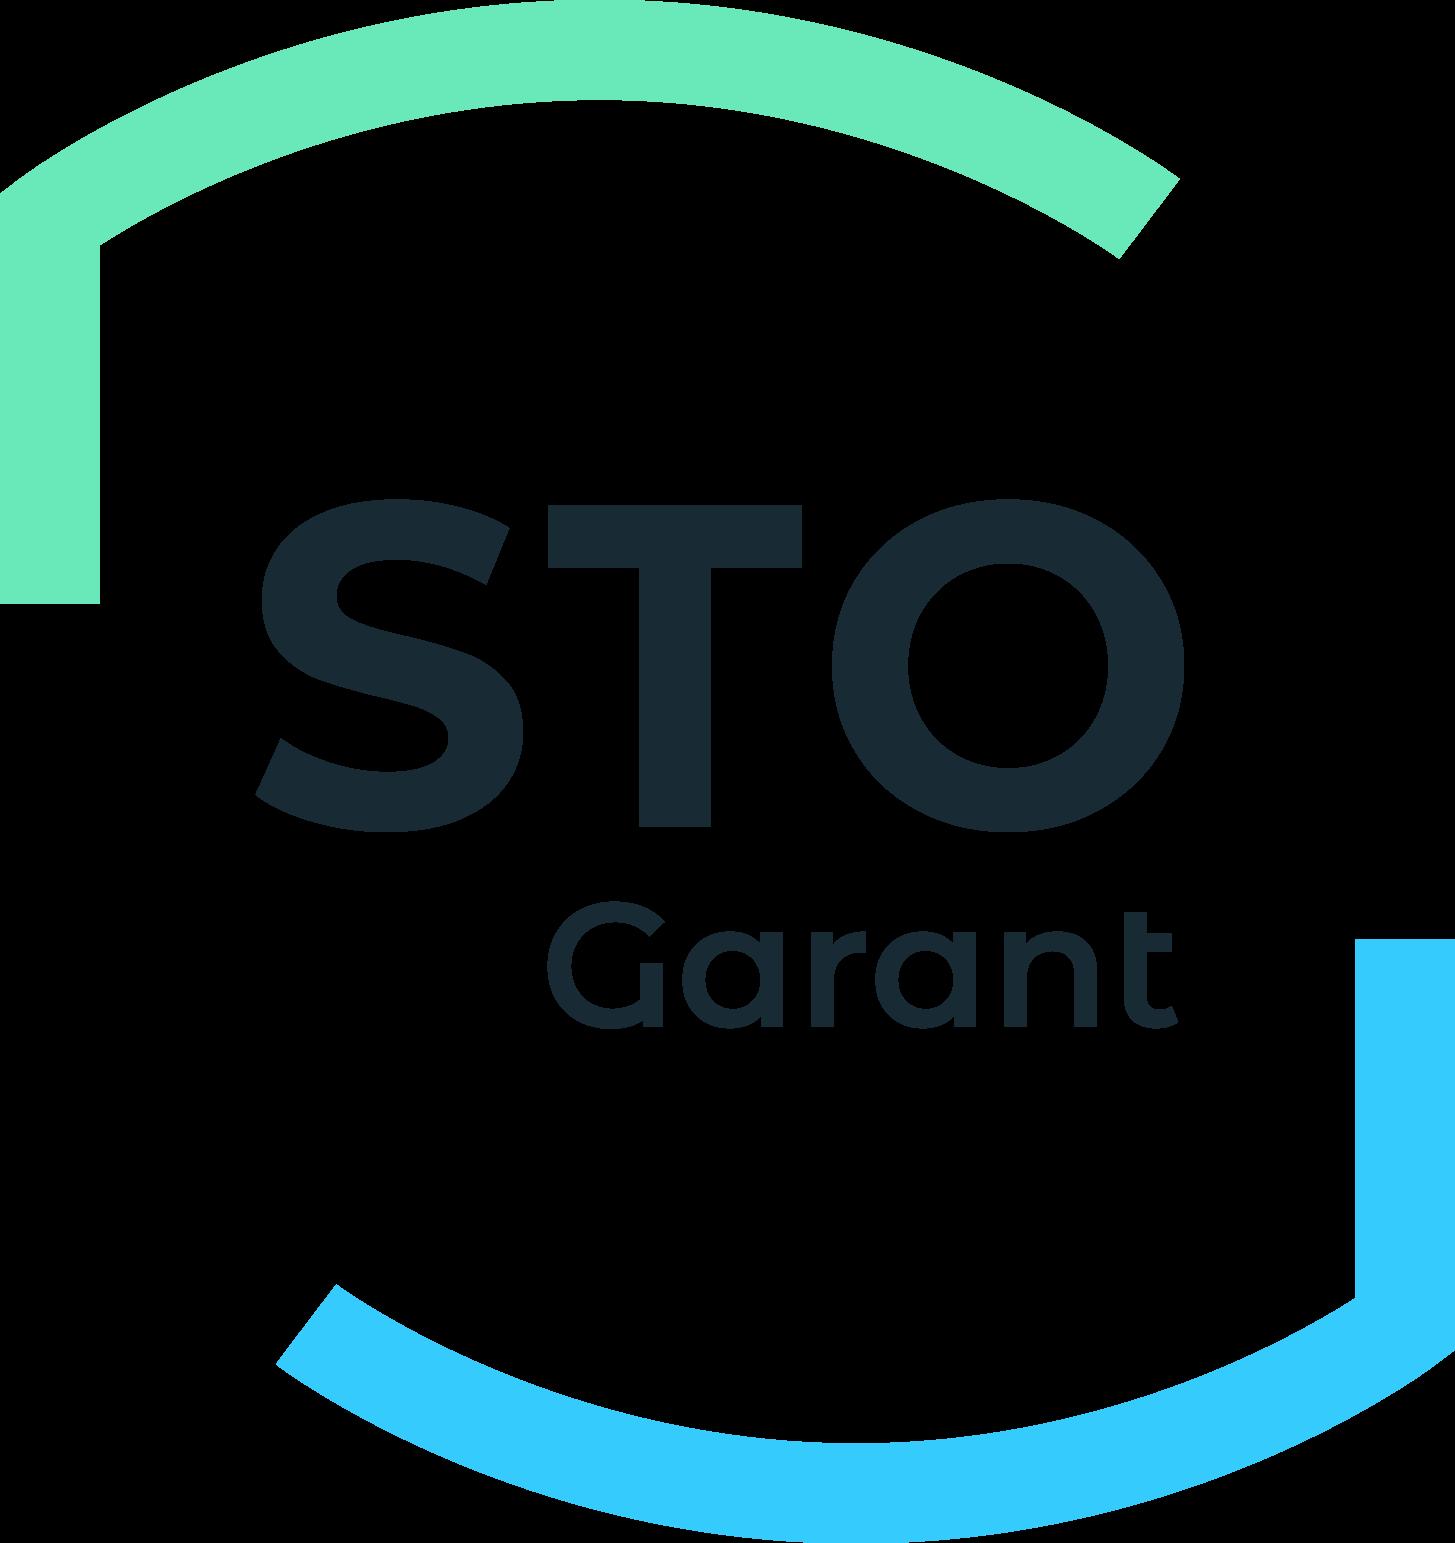 STO-GARANT